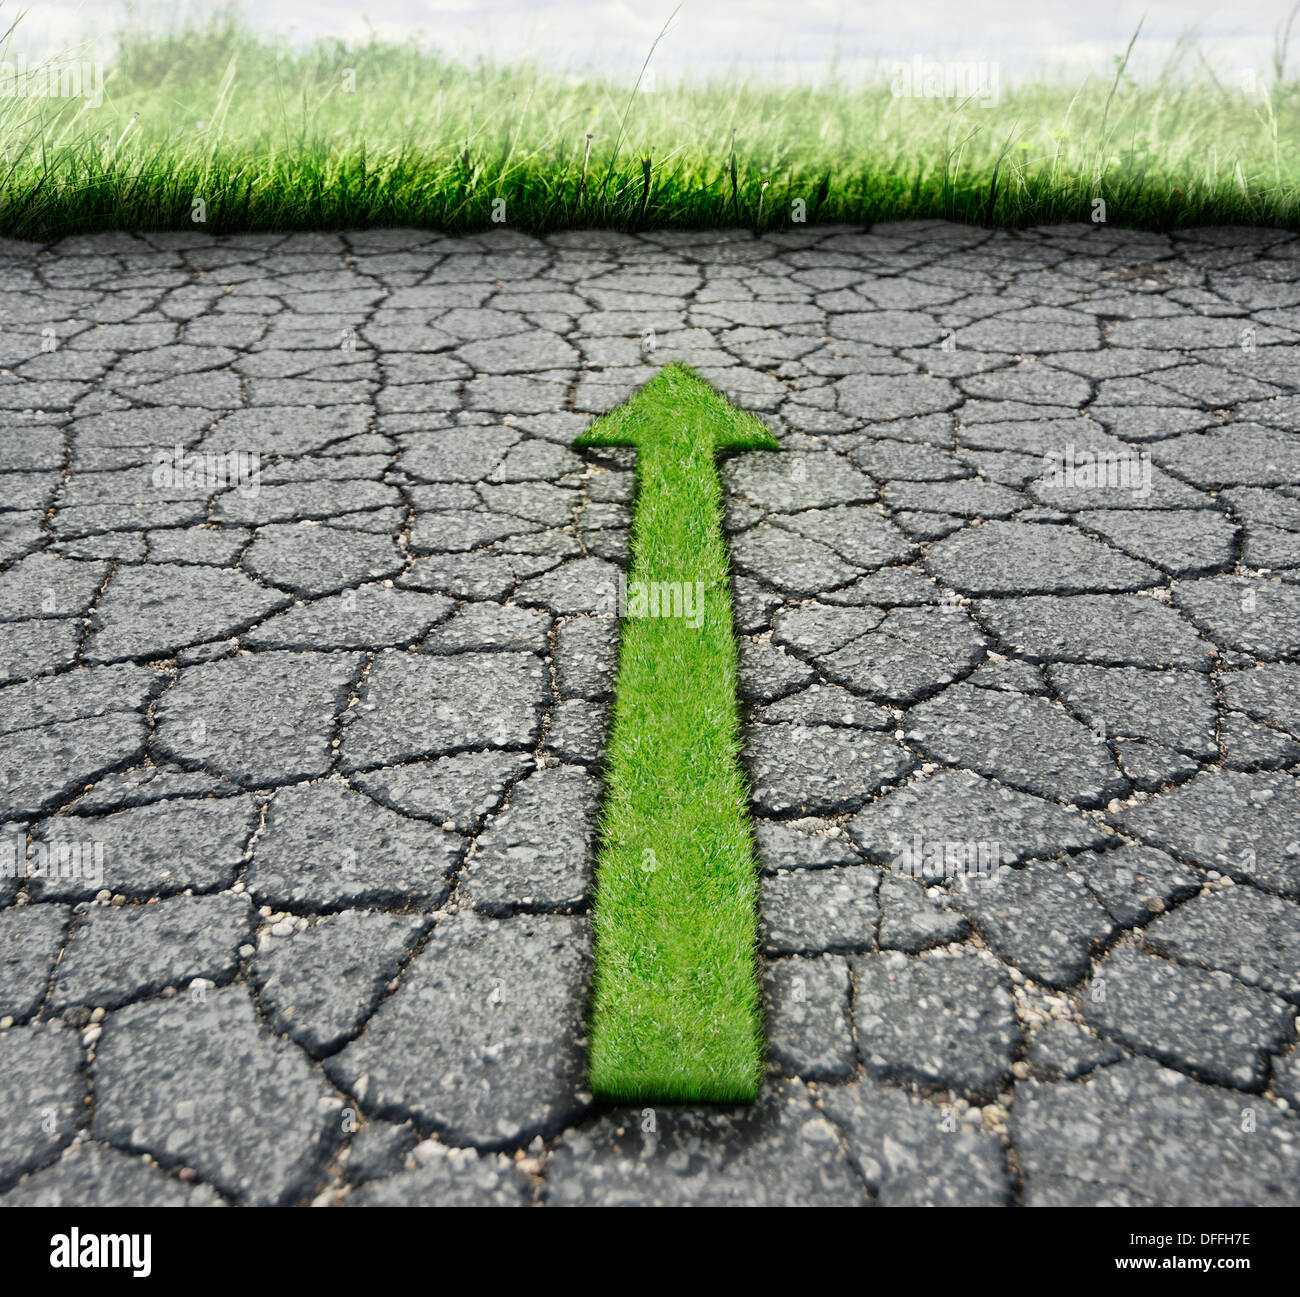 Asphalte brisée et herbe verte.Concept Nature Photo Stock